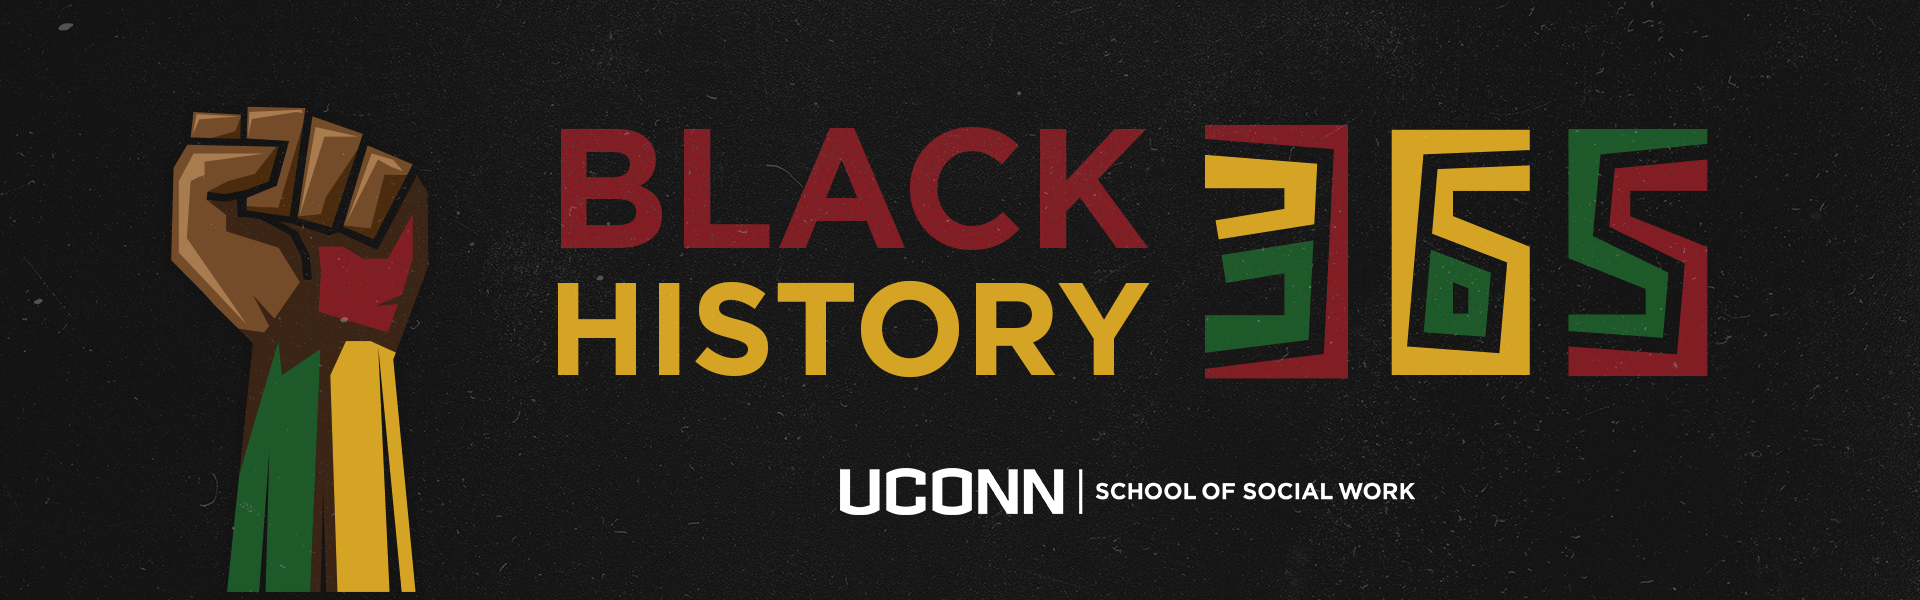 Black History 365